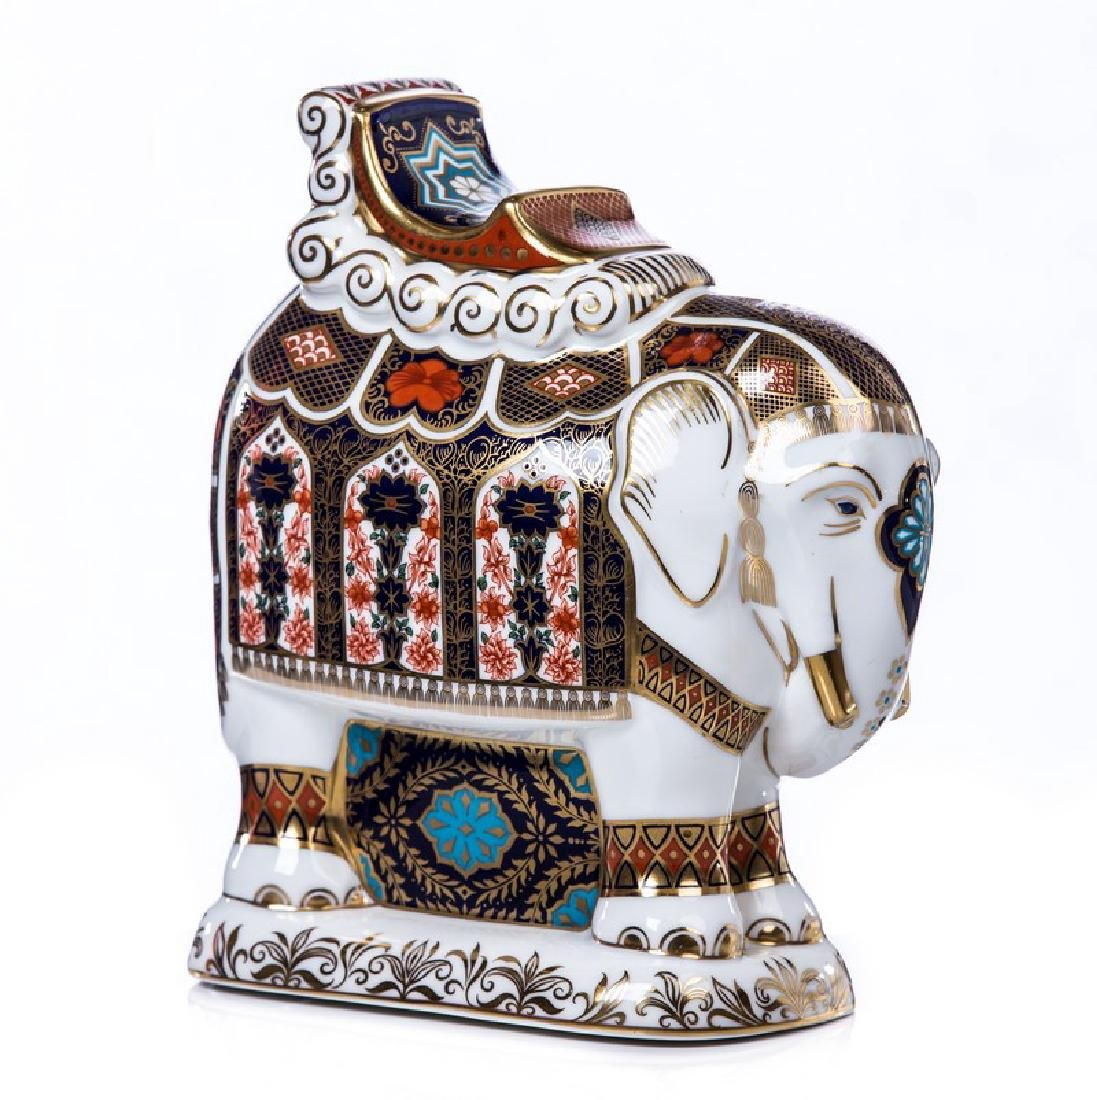 ROYAL CROWN DERBY PORCELAIN ELEPHANT